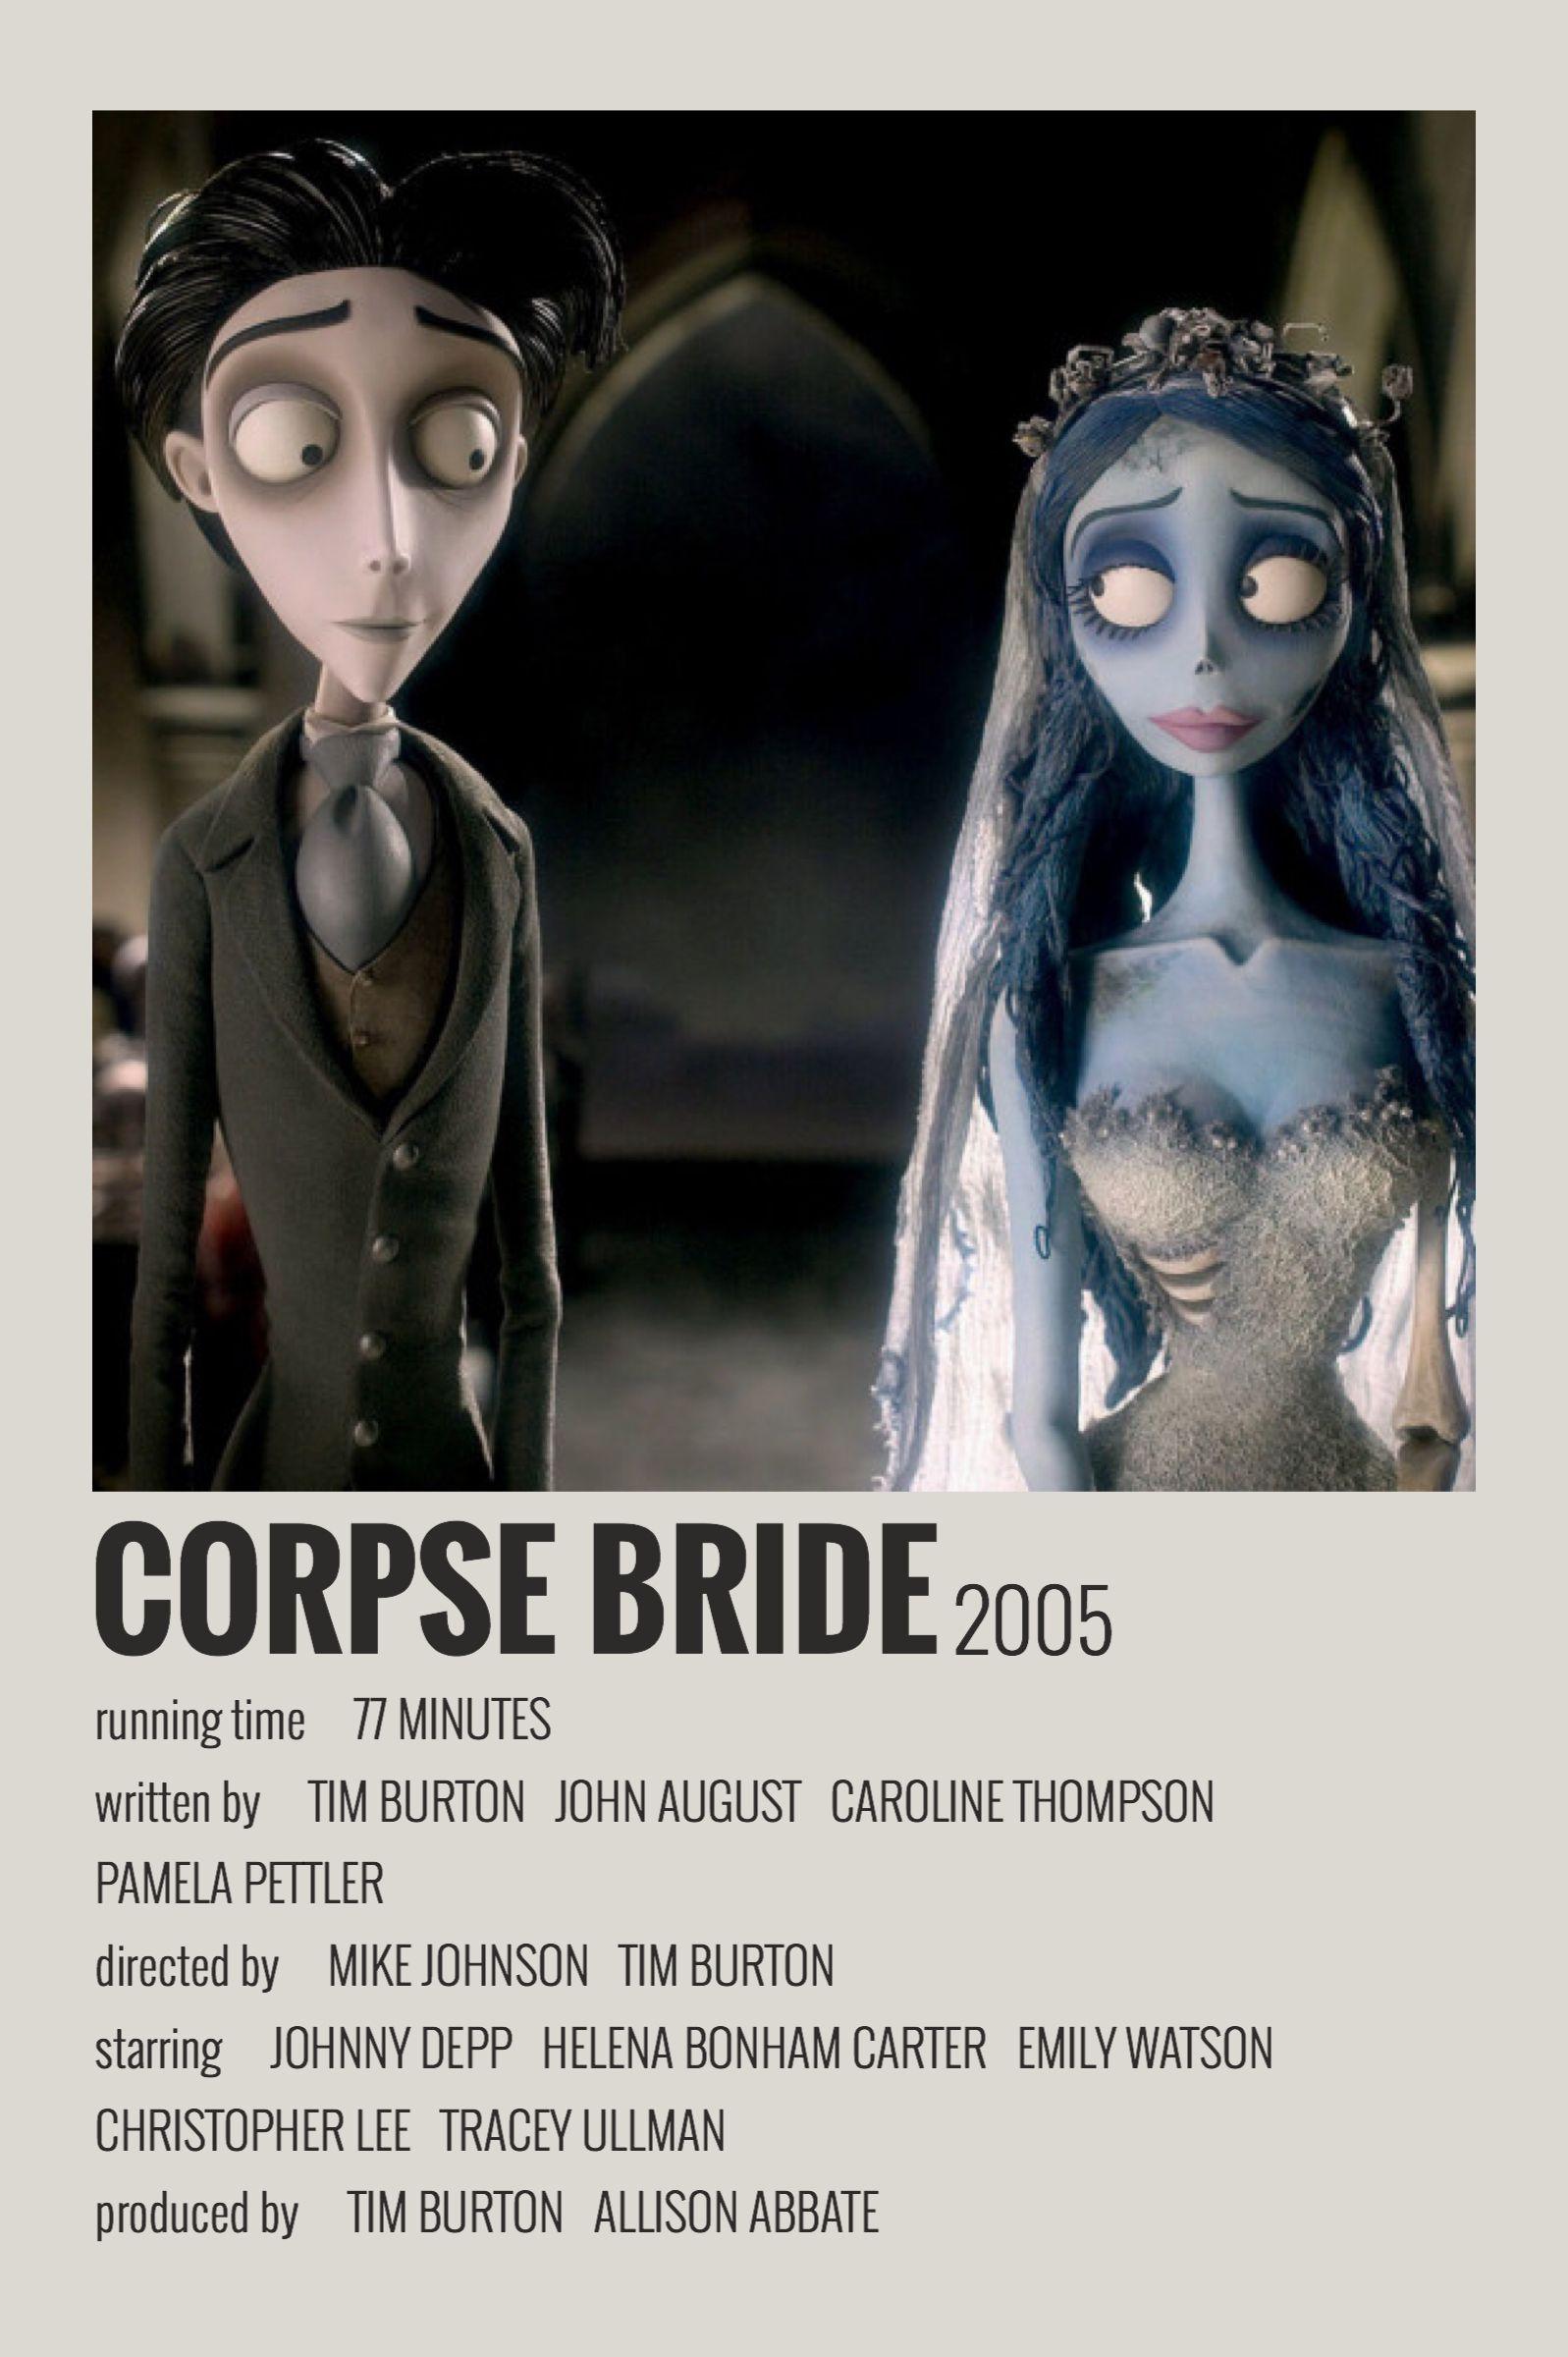 Alternative Minimalist Movie/Show Polaroid Poster - Corpse Bride